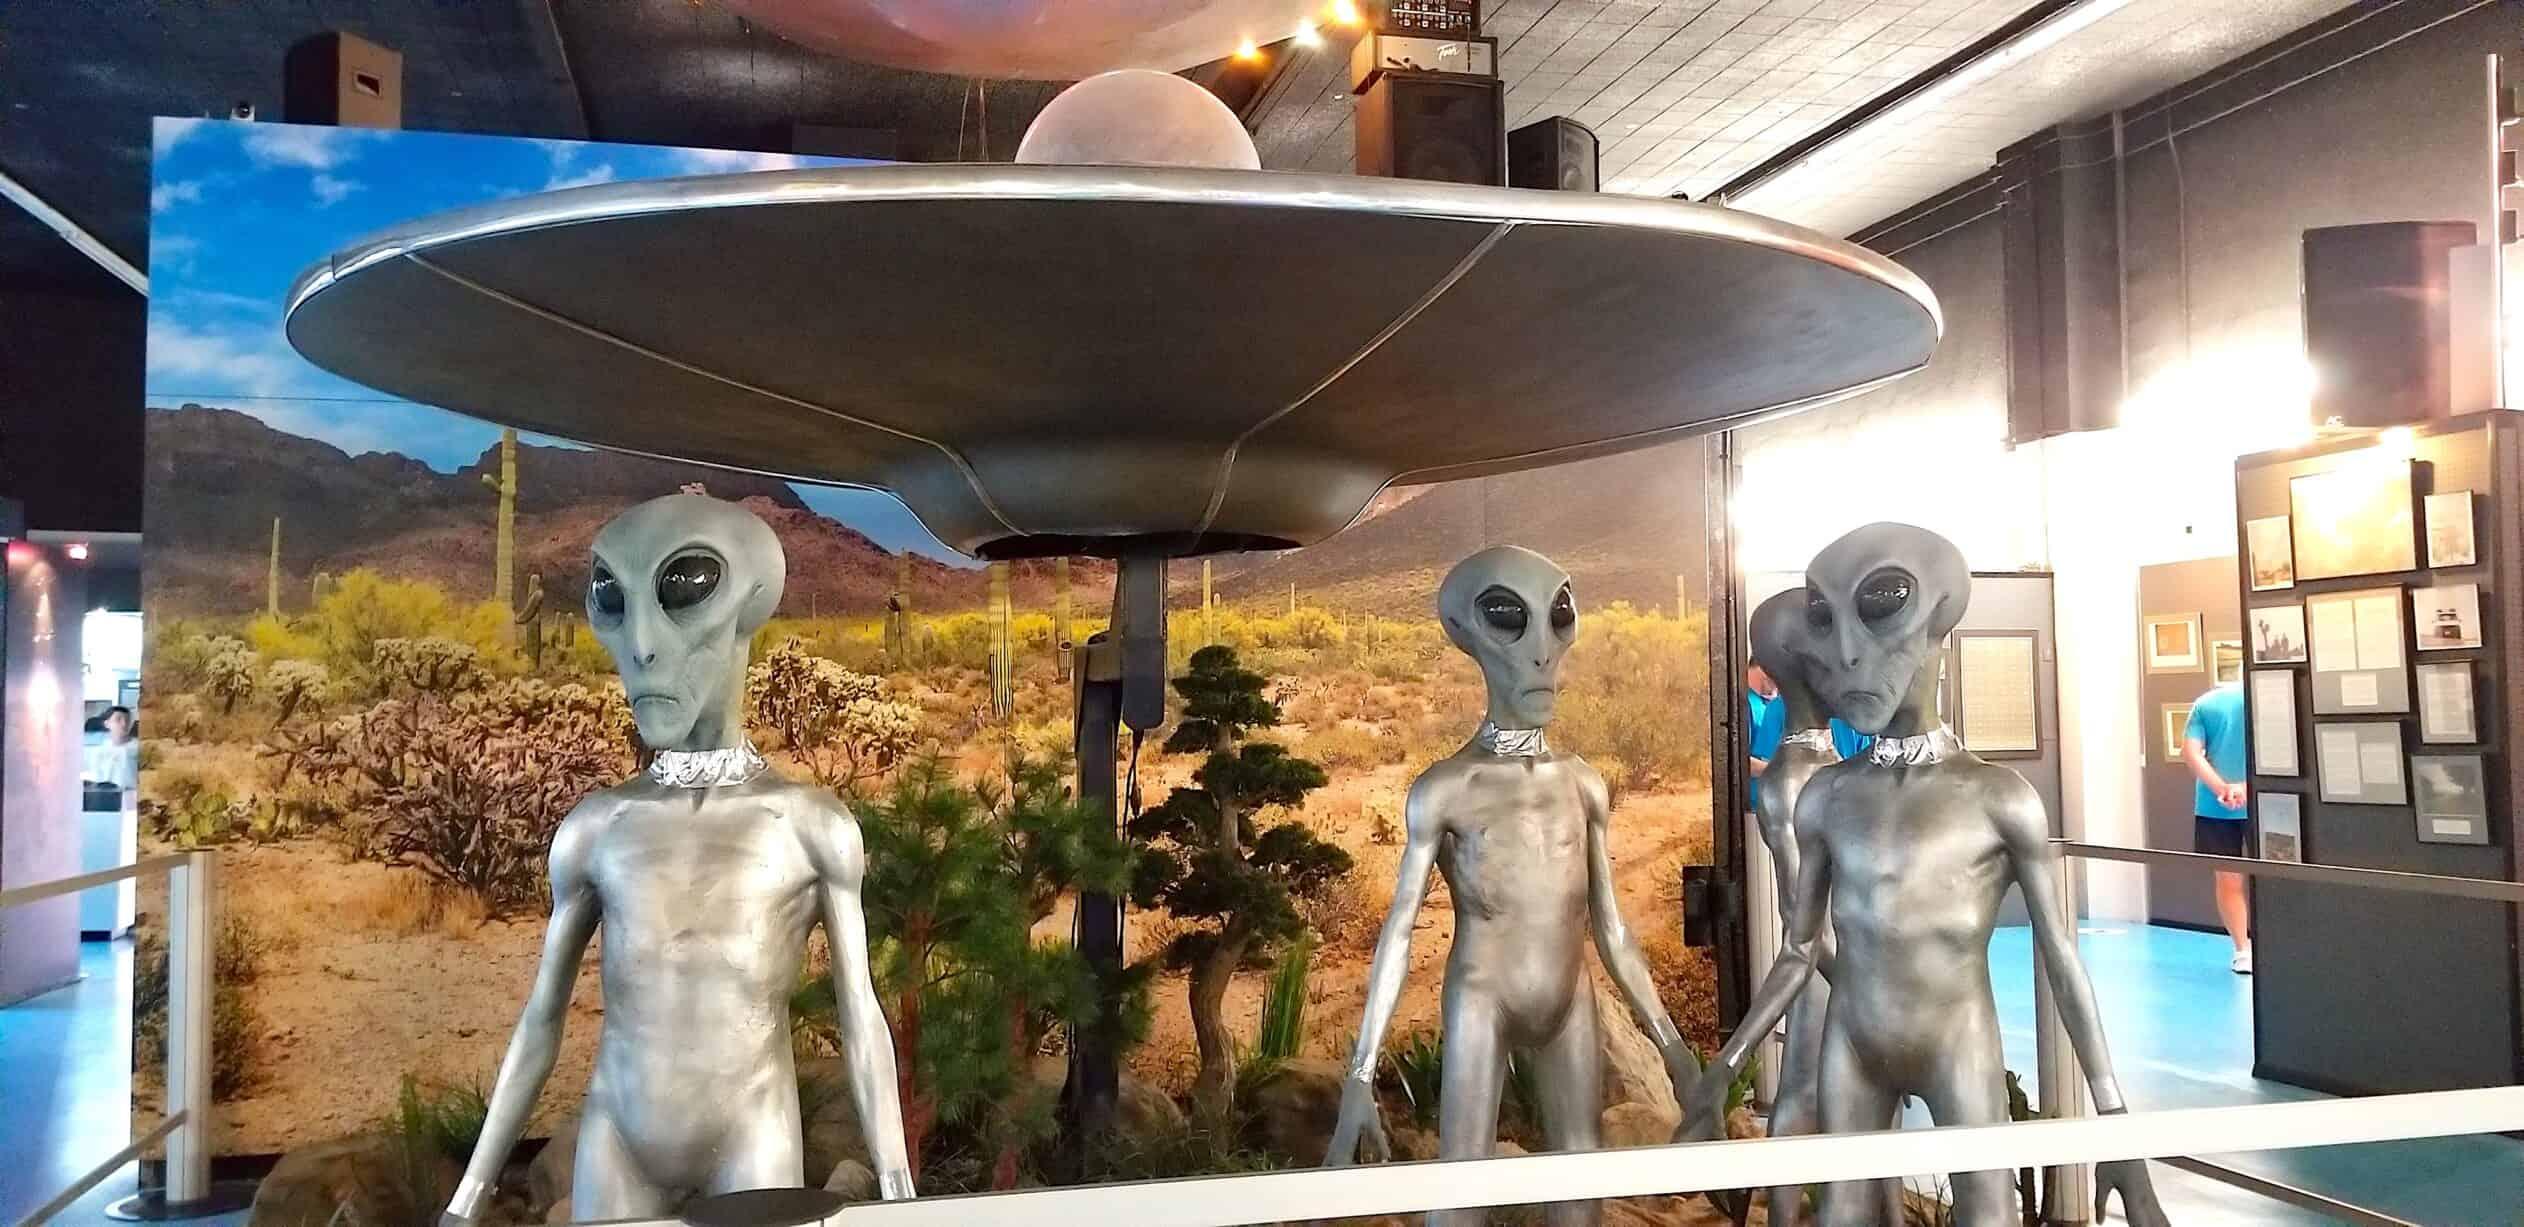 roswell alien spaceship display